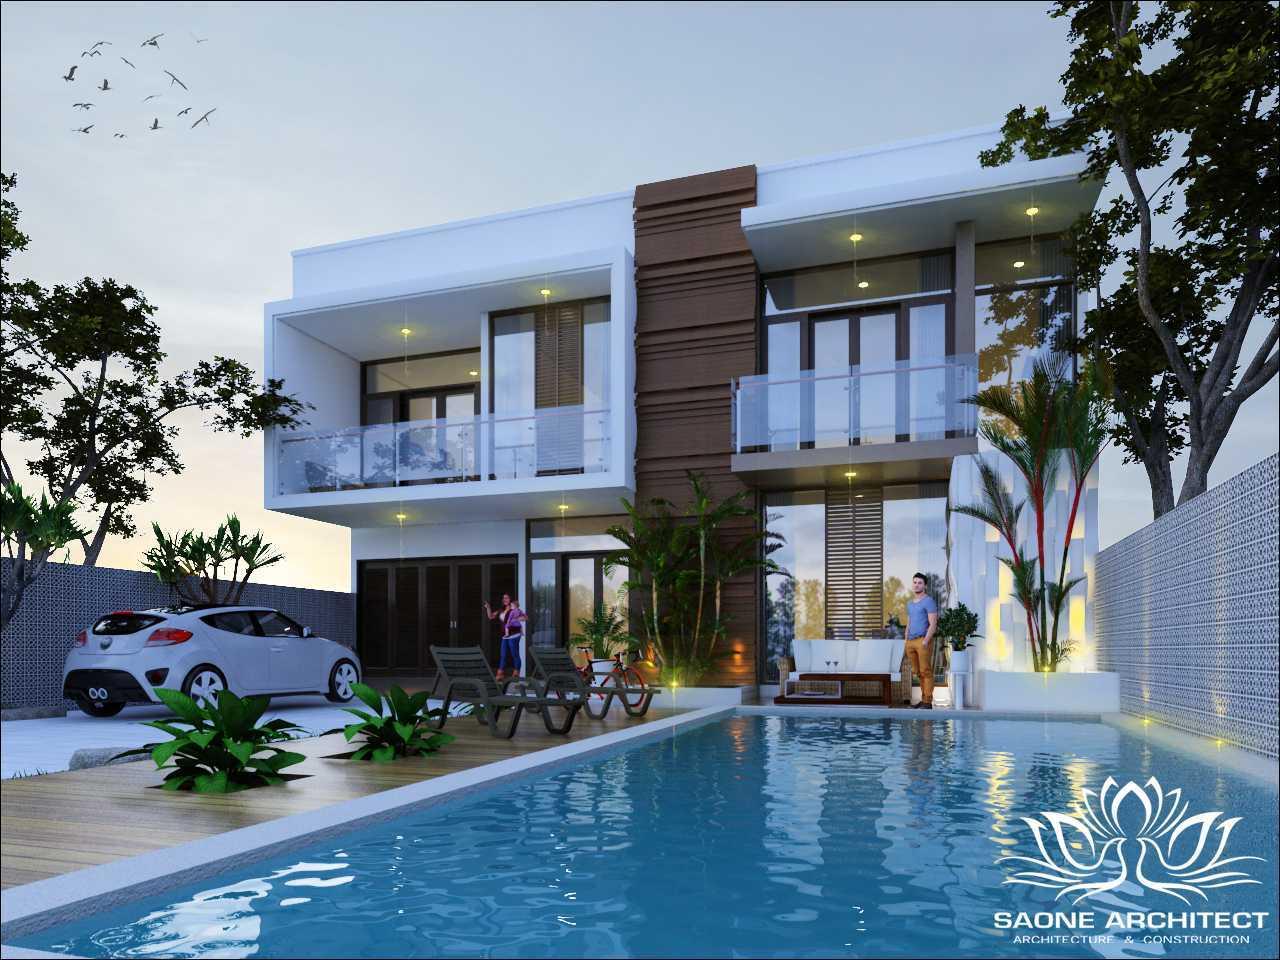 Saone Architect Private Villa Jimbaran Bali Jimbaran, Kuta Sel., Kabupaten Badung, Bali, Indonesia Jimbaran, Kuta Sel., Kabupaten Badung, Bali, Indonesia Exterior View Tropical 49723